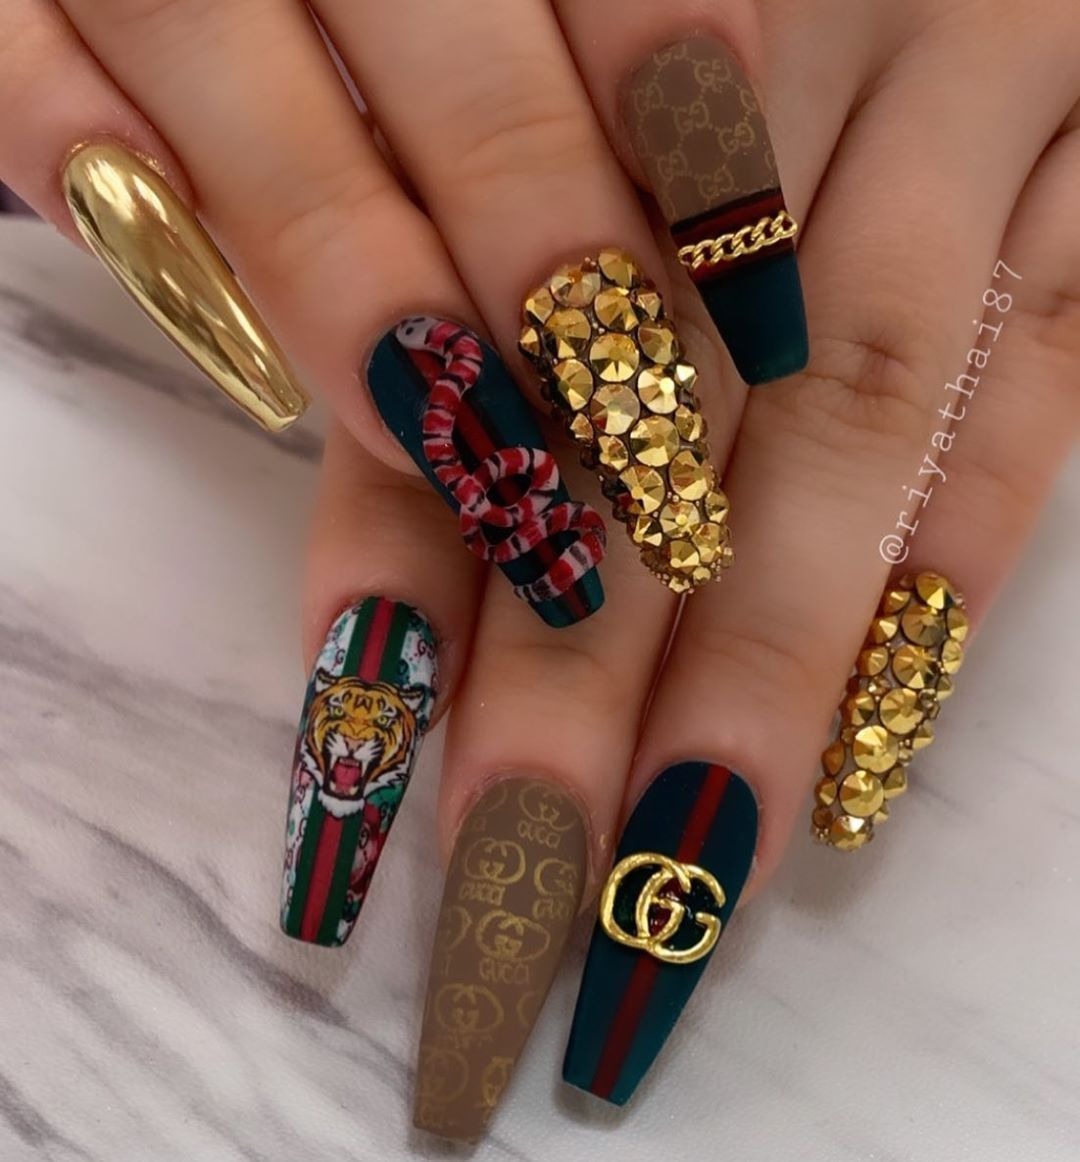 46 Pretty And Popular Chrome Nail Art Designs Gucci Nails Ideas Of Gucci Nails Guccinails Gucci Nails In 2020 Gucci Nails Cute Acrylic Nail Designs Luxury Nails